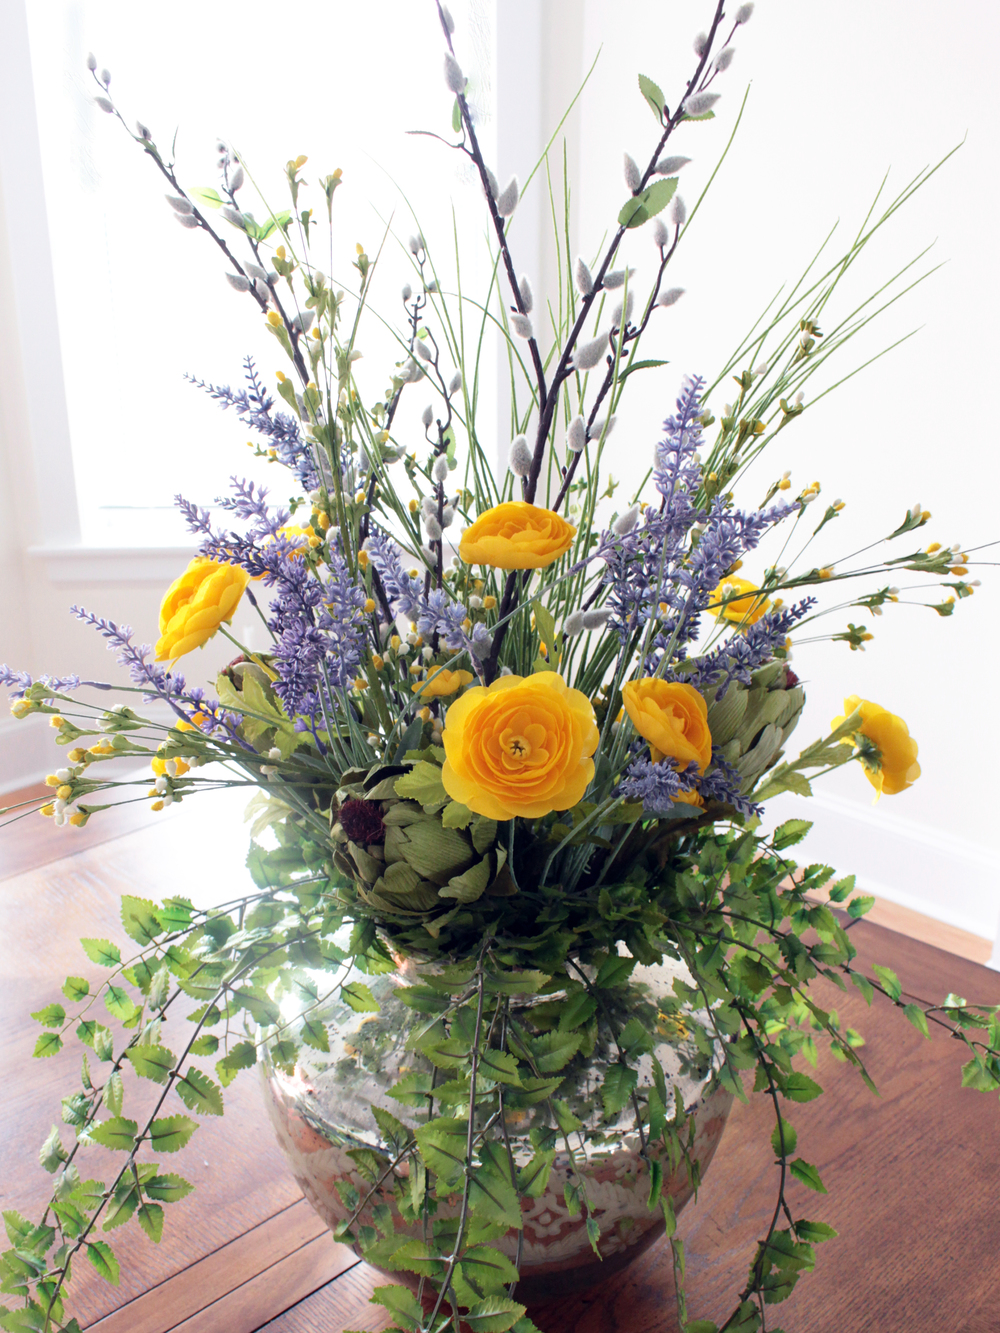 Floral Arrangements - Spring Edition (Sugar & Roses)